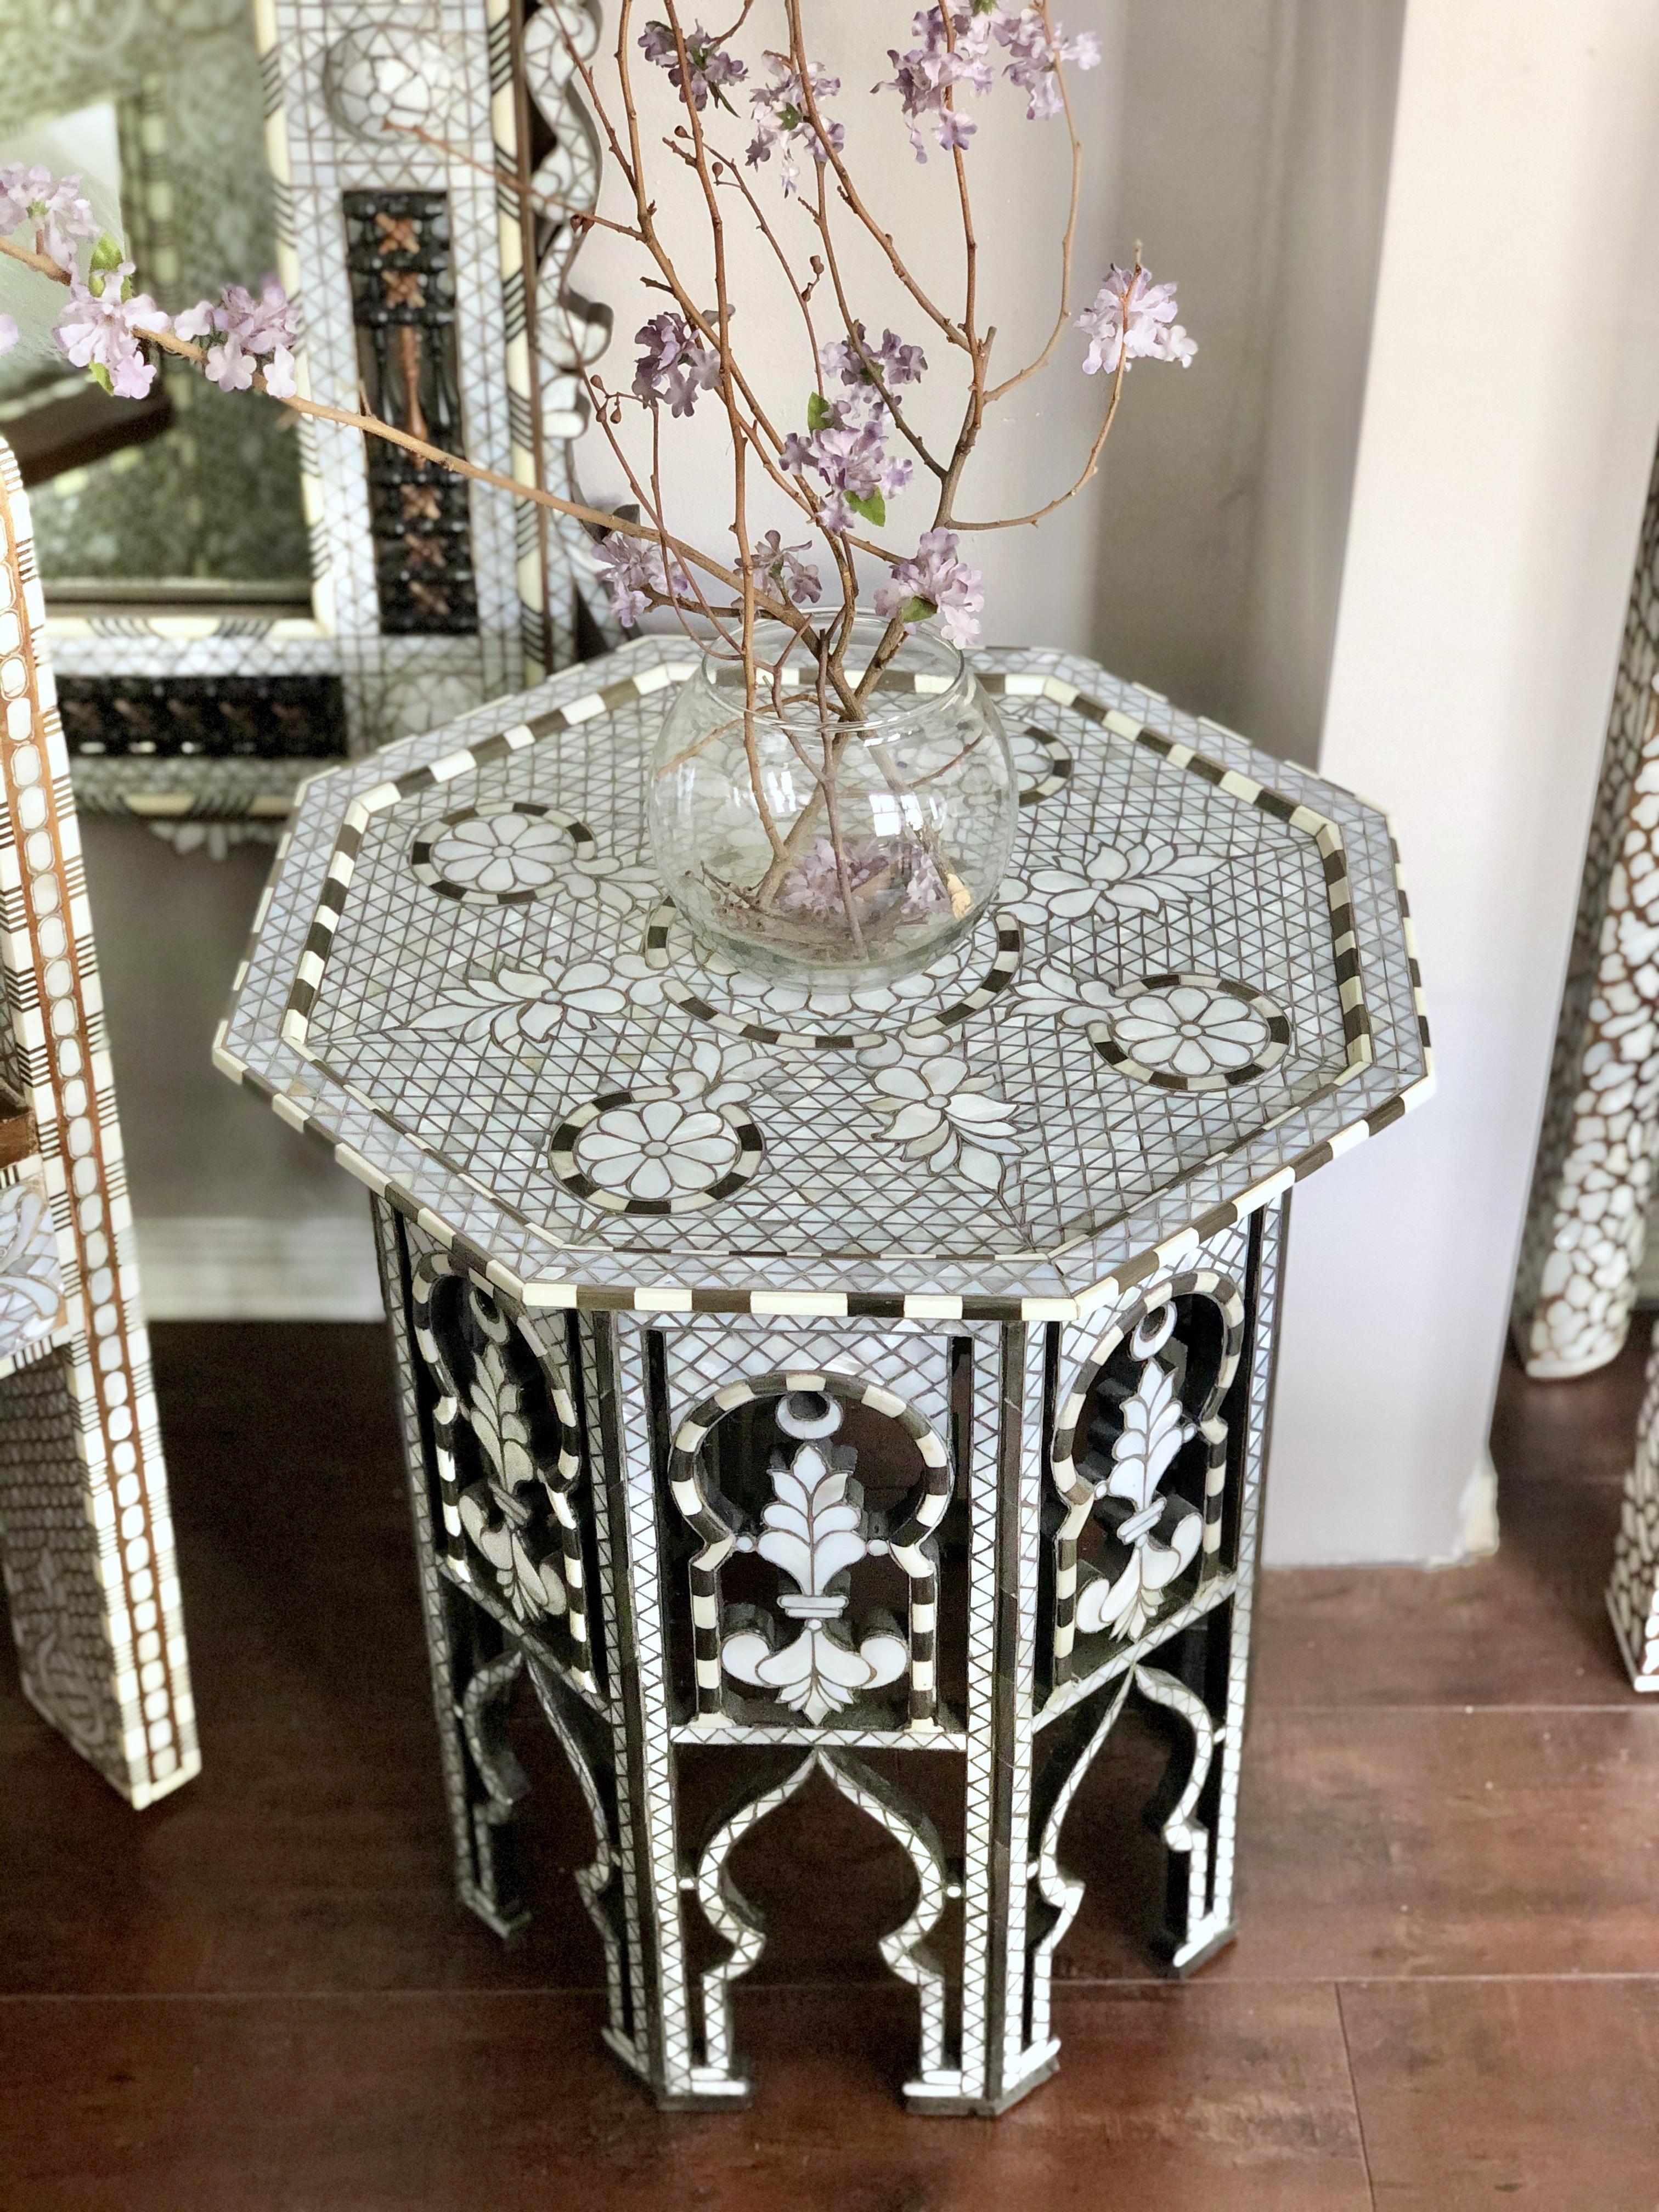 Octagonal Syrian table